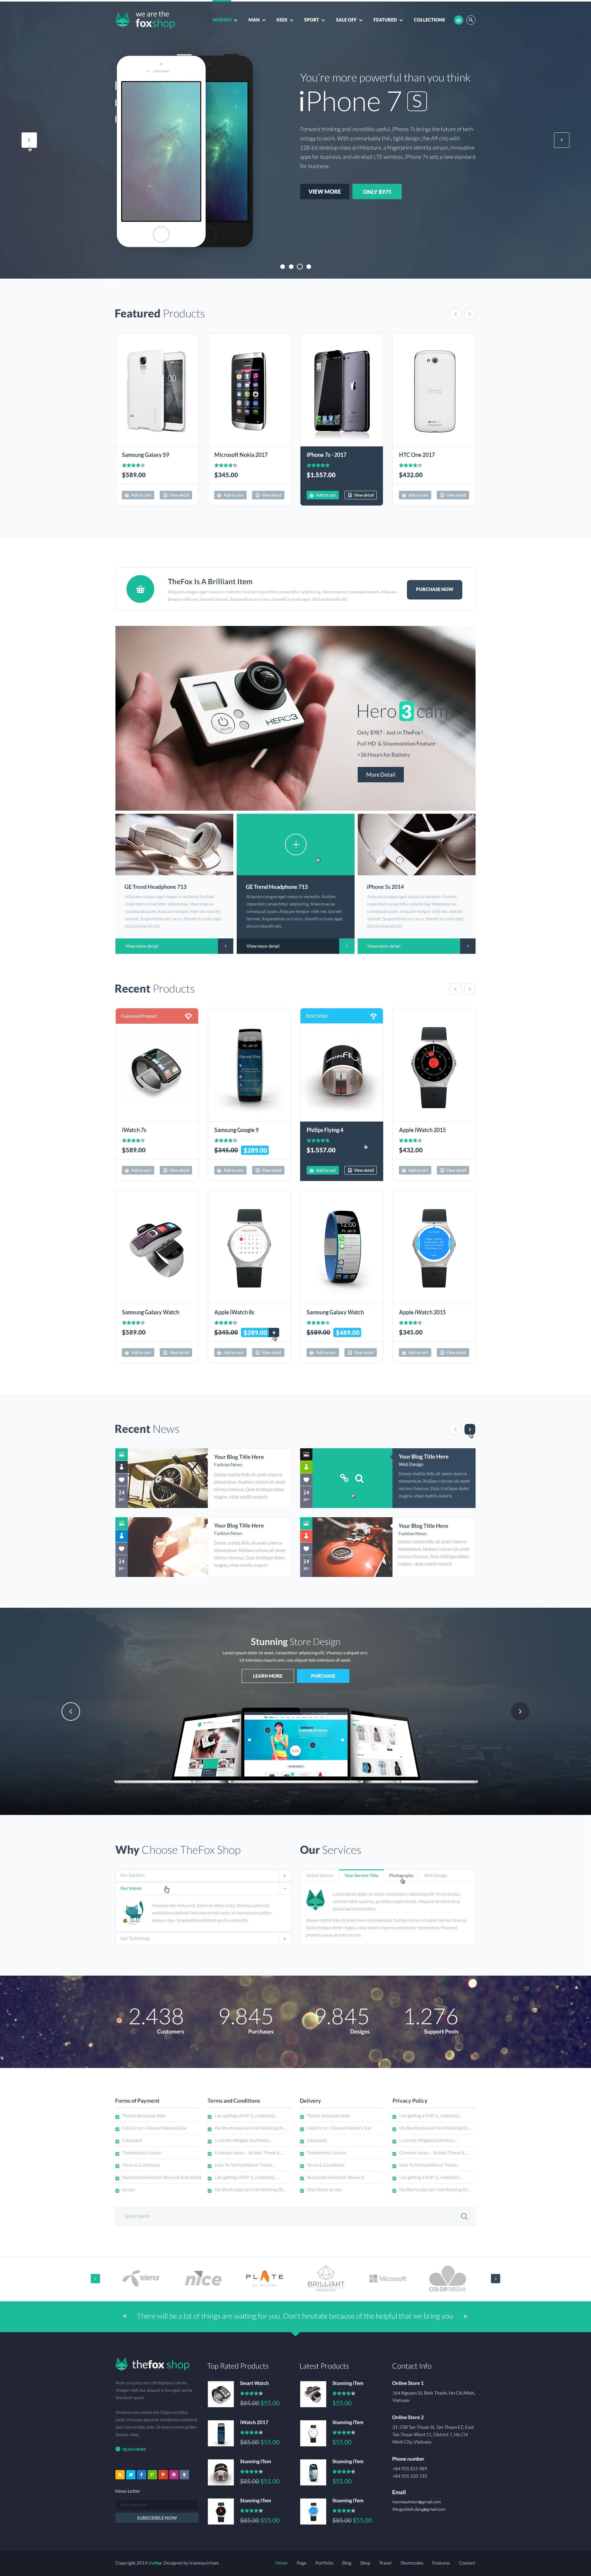 TheFox   Multi-Purpose PSD Template by tranmautritam   ThemeForest